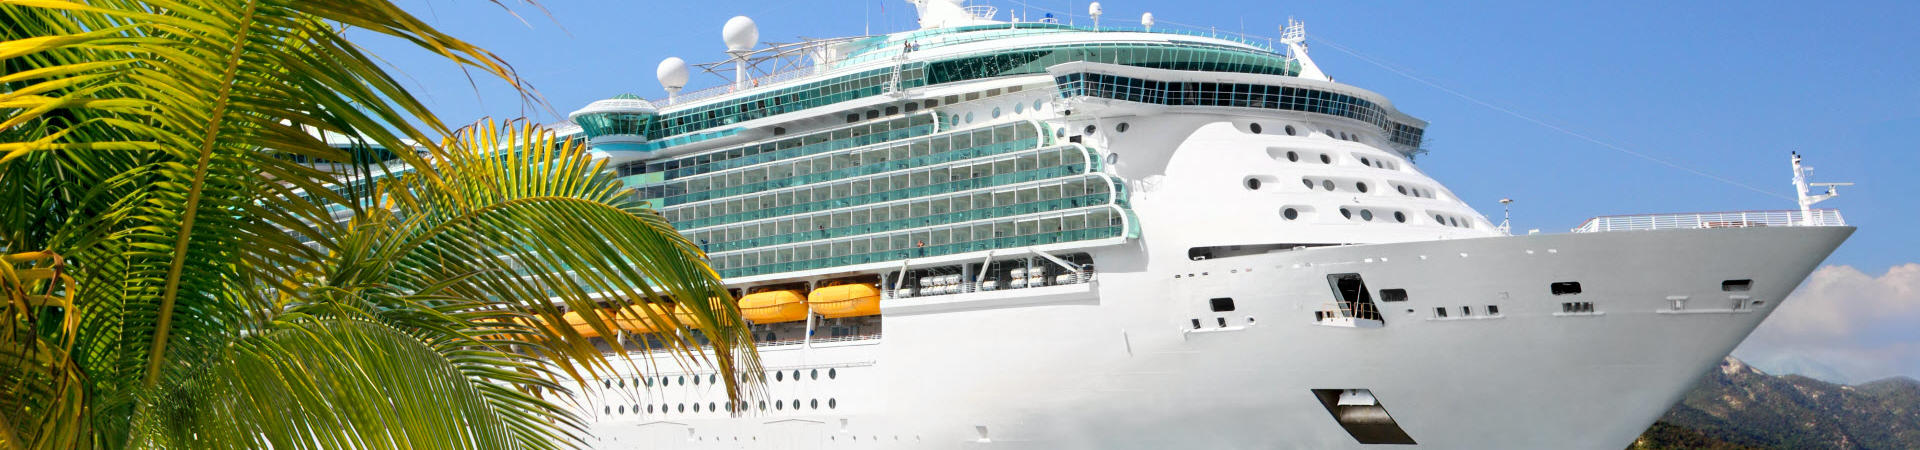 Budget Cruises